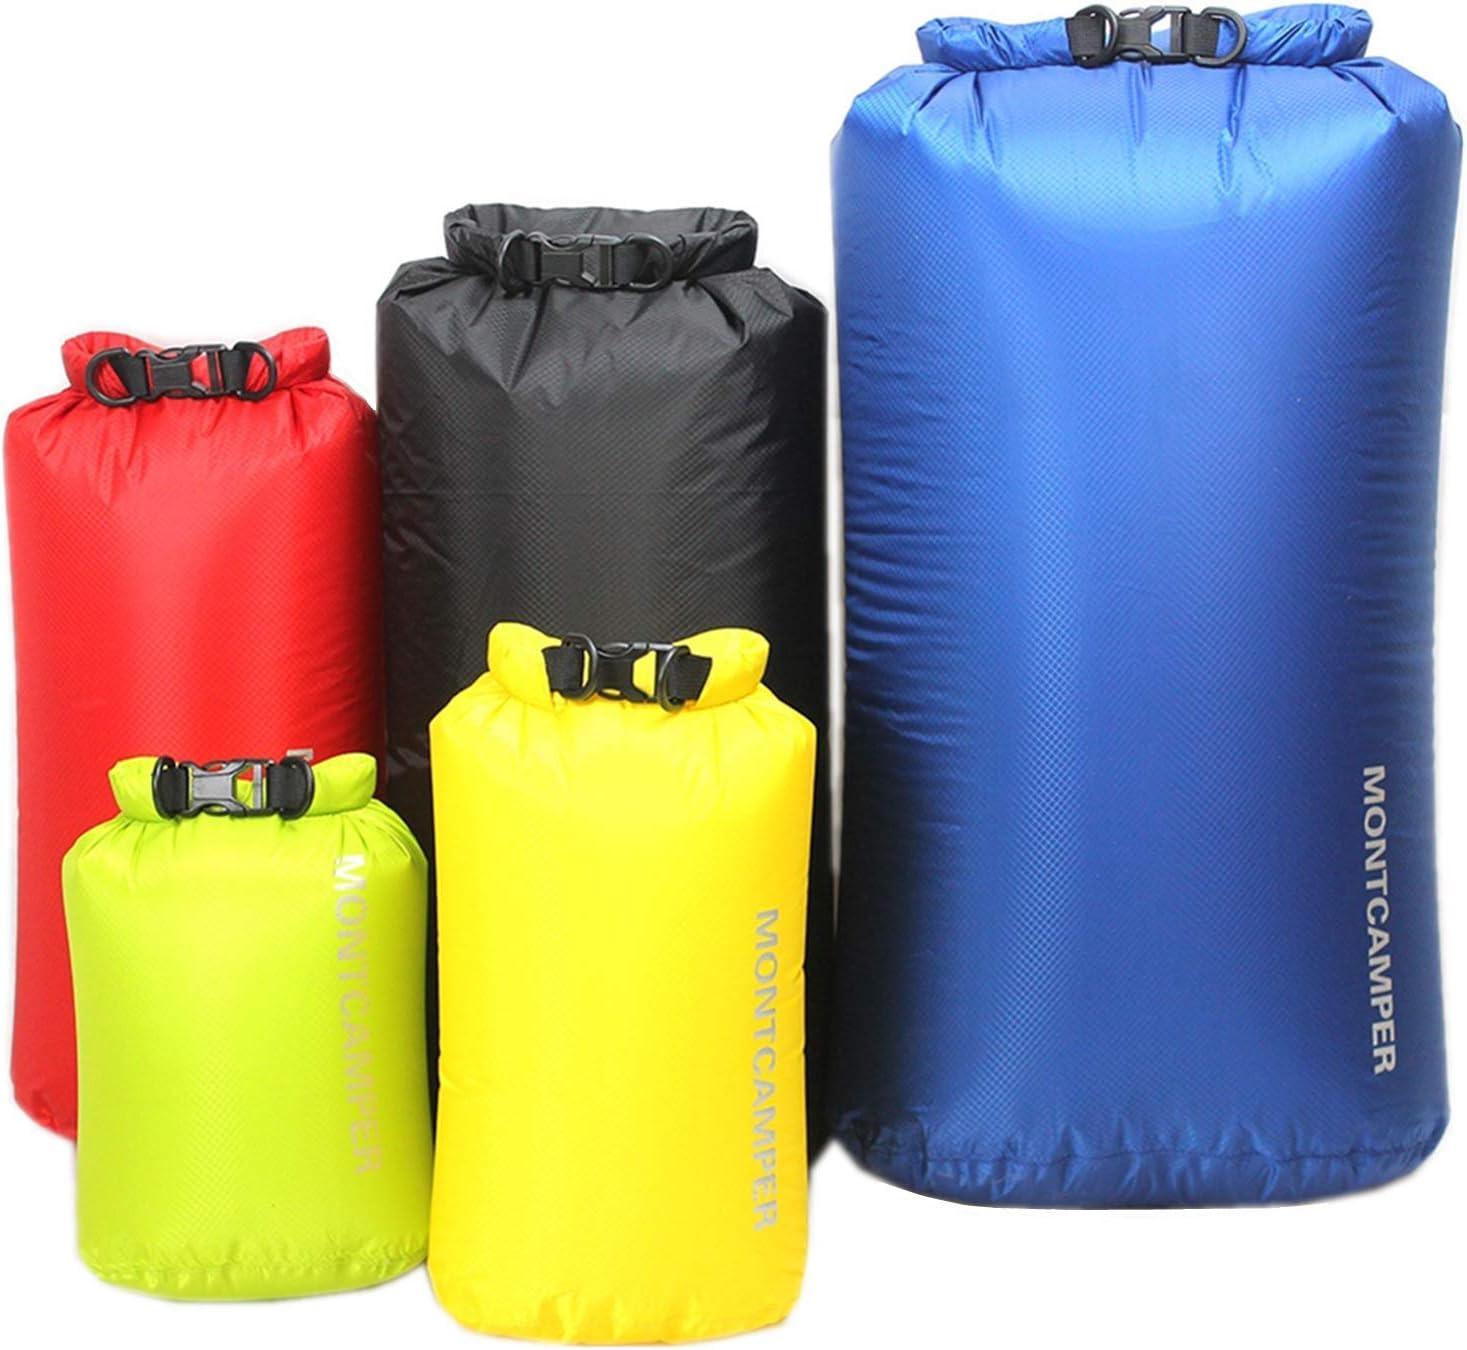 Ultralight Dry Ranking Free shipping / New TOP15 Bag Waterproof Backpacki Set for Kayaking